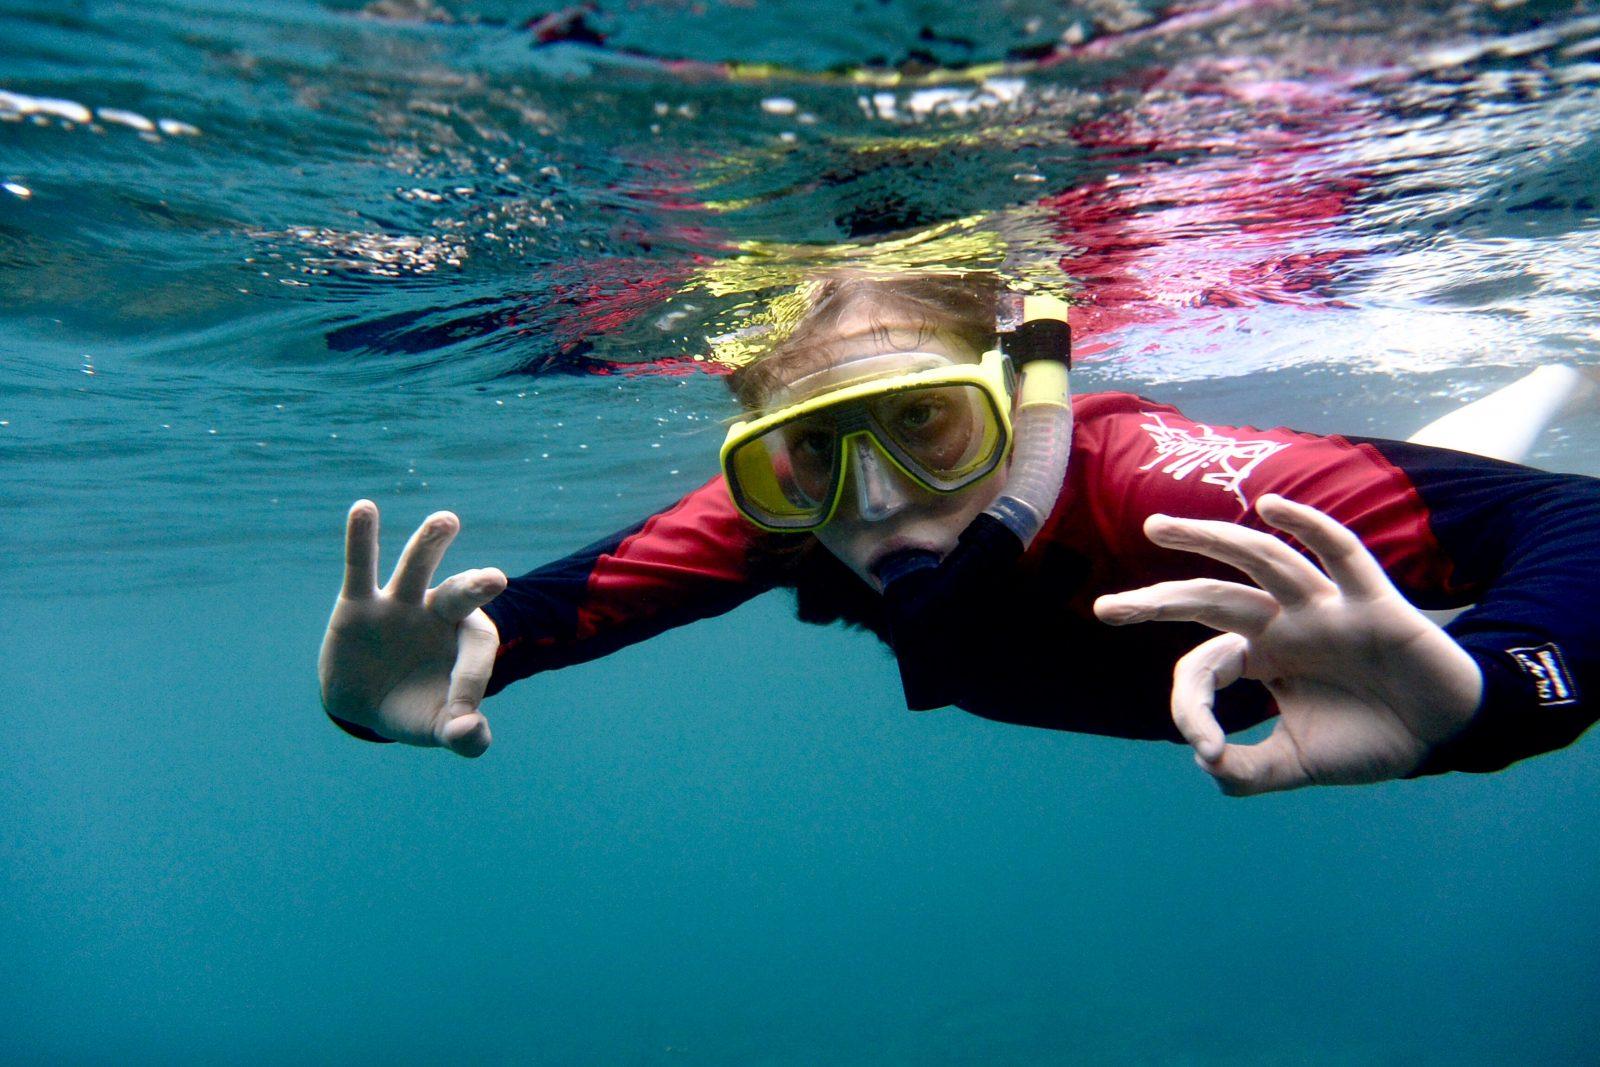 WaGaLiGong-Surf-Hostel-Snorkeling-e1465017124583